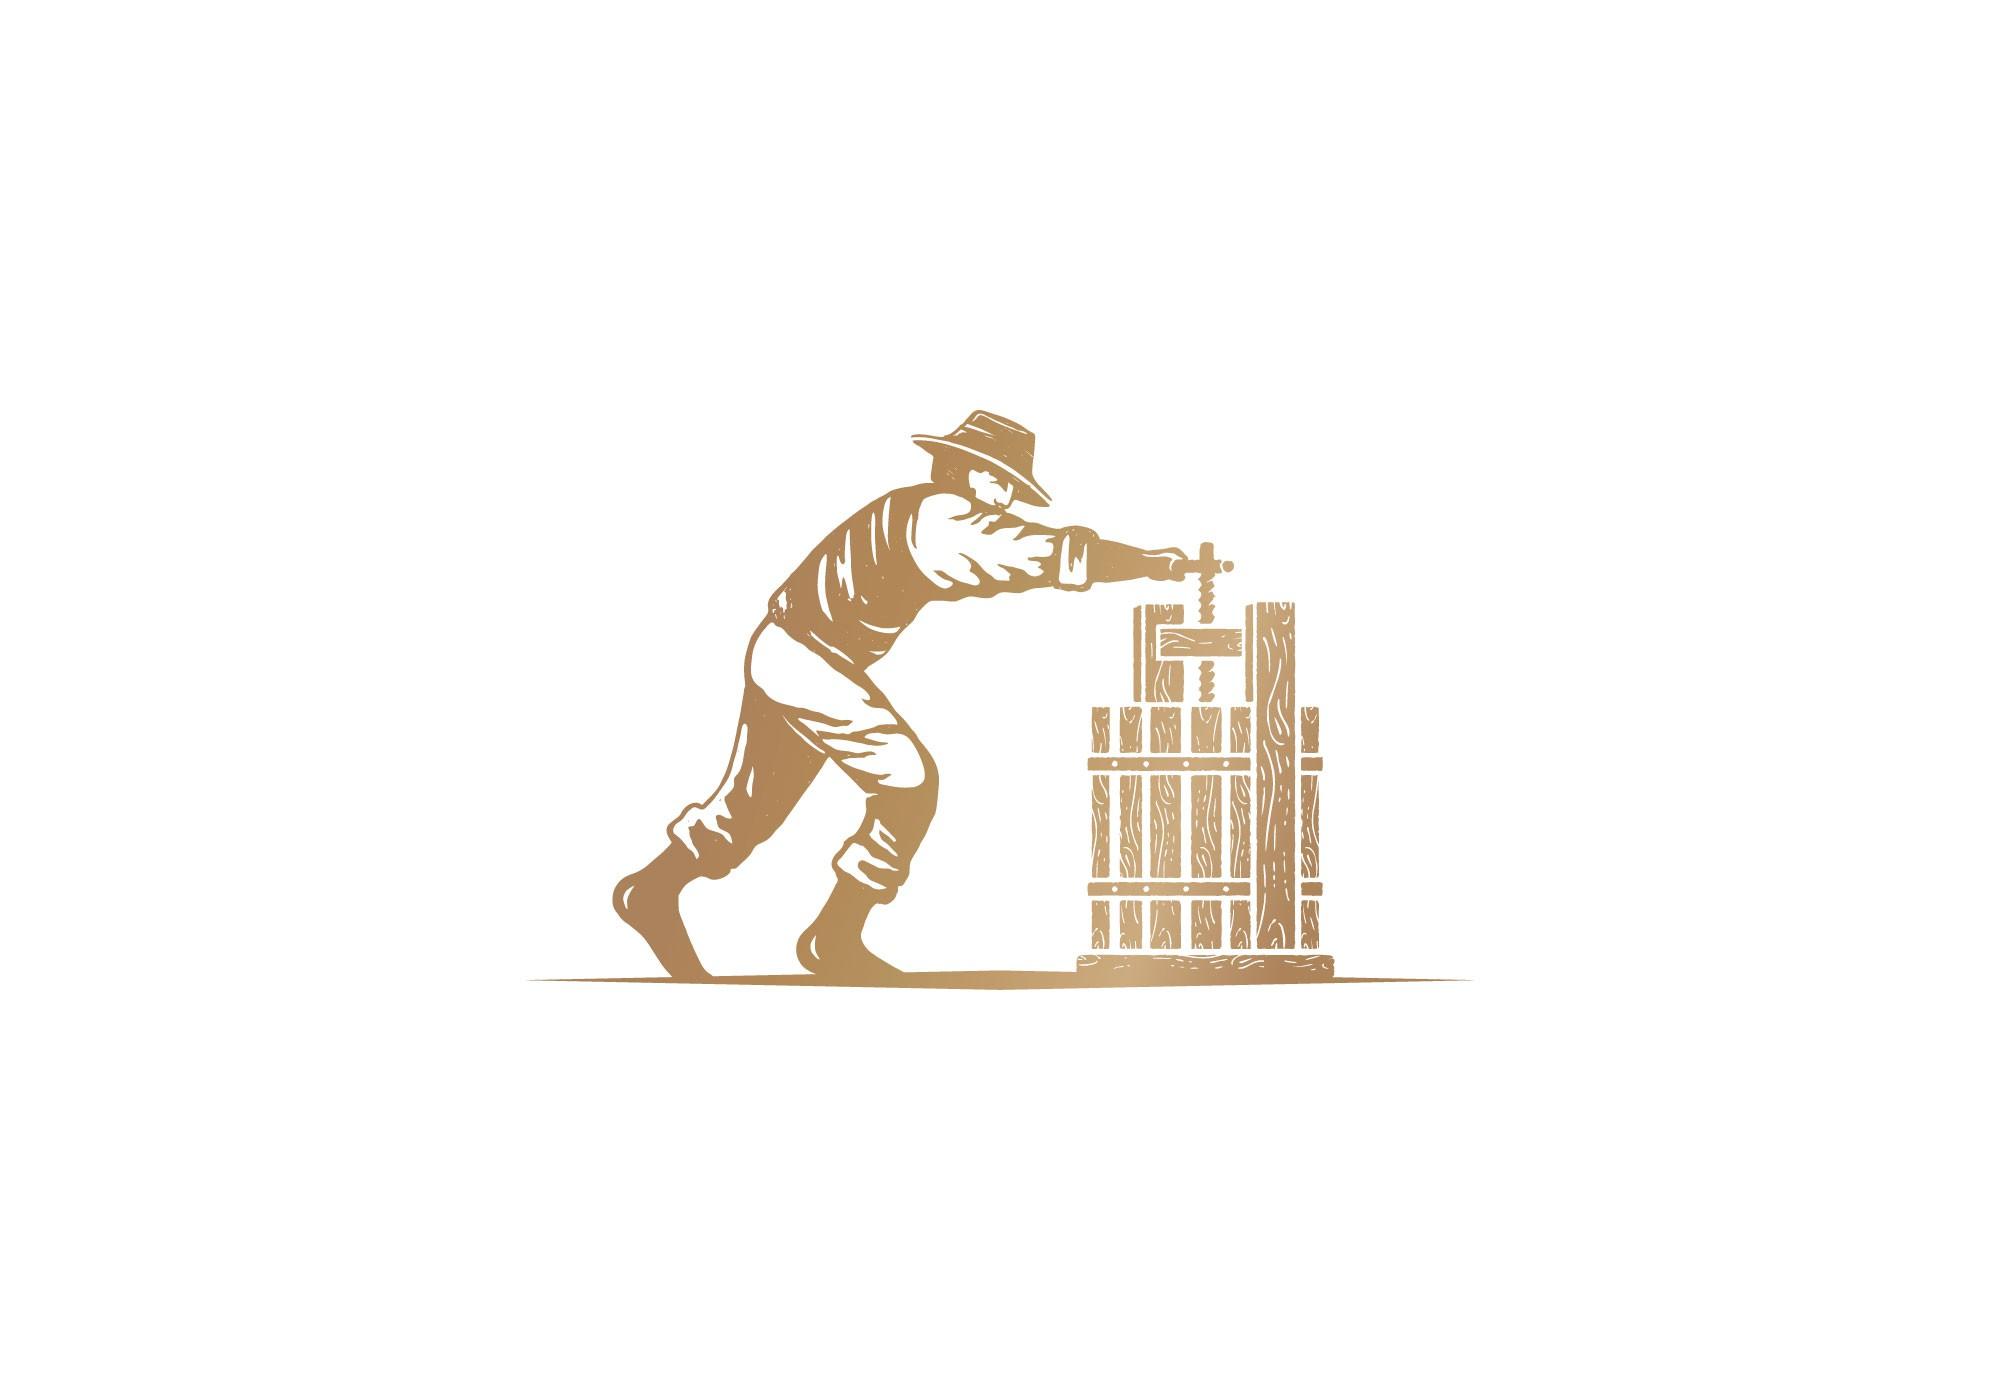 Create a brand logo design for Pressed Spirits - a premium grape-based distillery